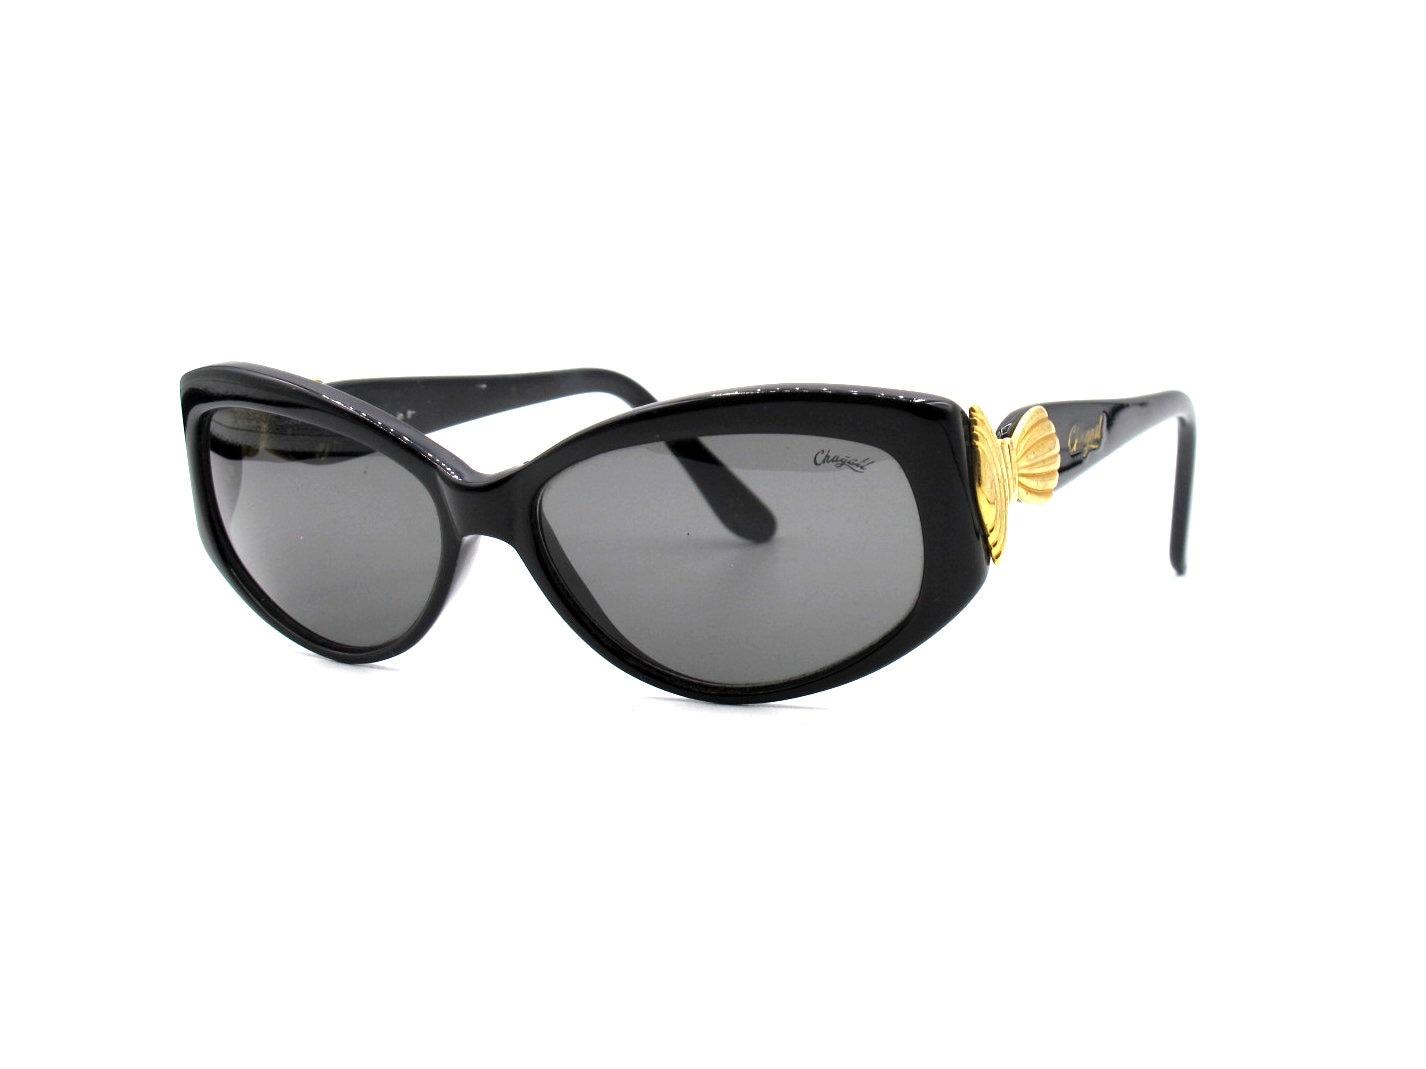 Classic Genuine Vintage Deadstock 80s 90s Style Brown /& Black Cat Eye Sunglasses